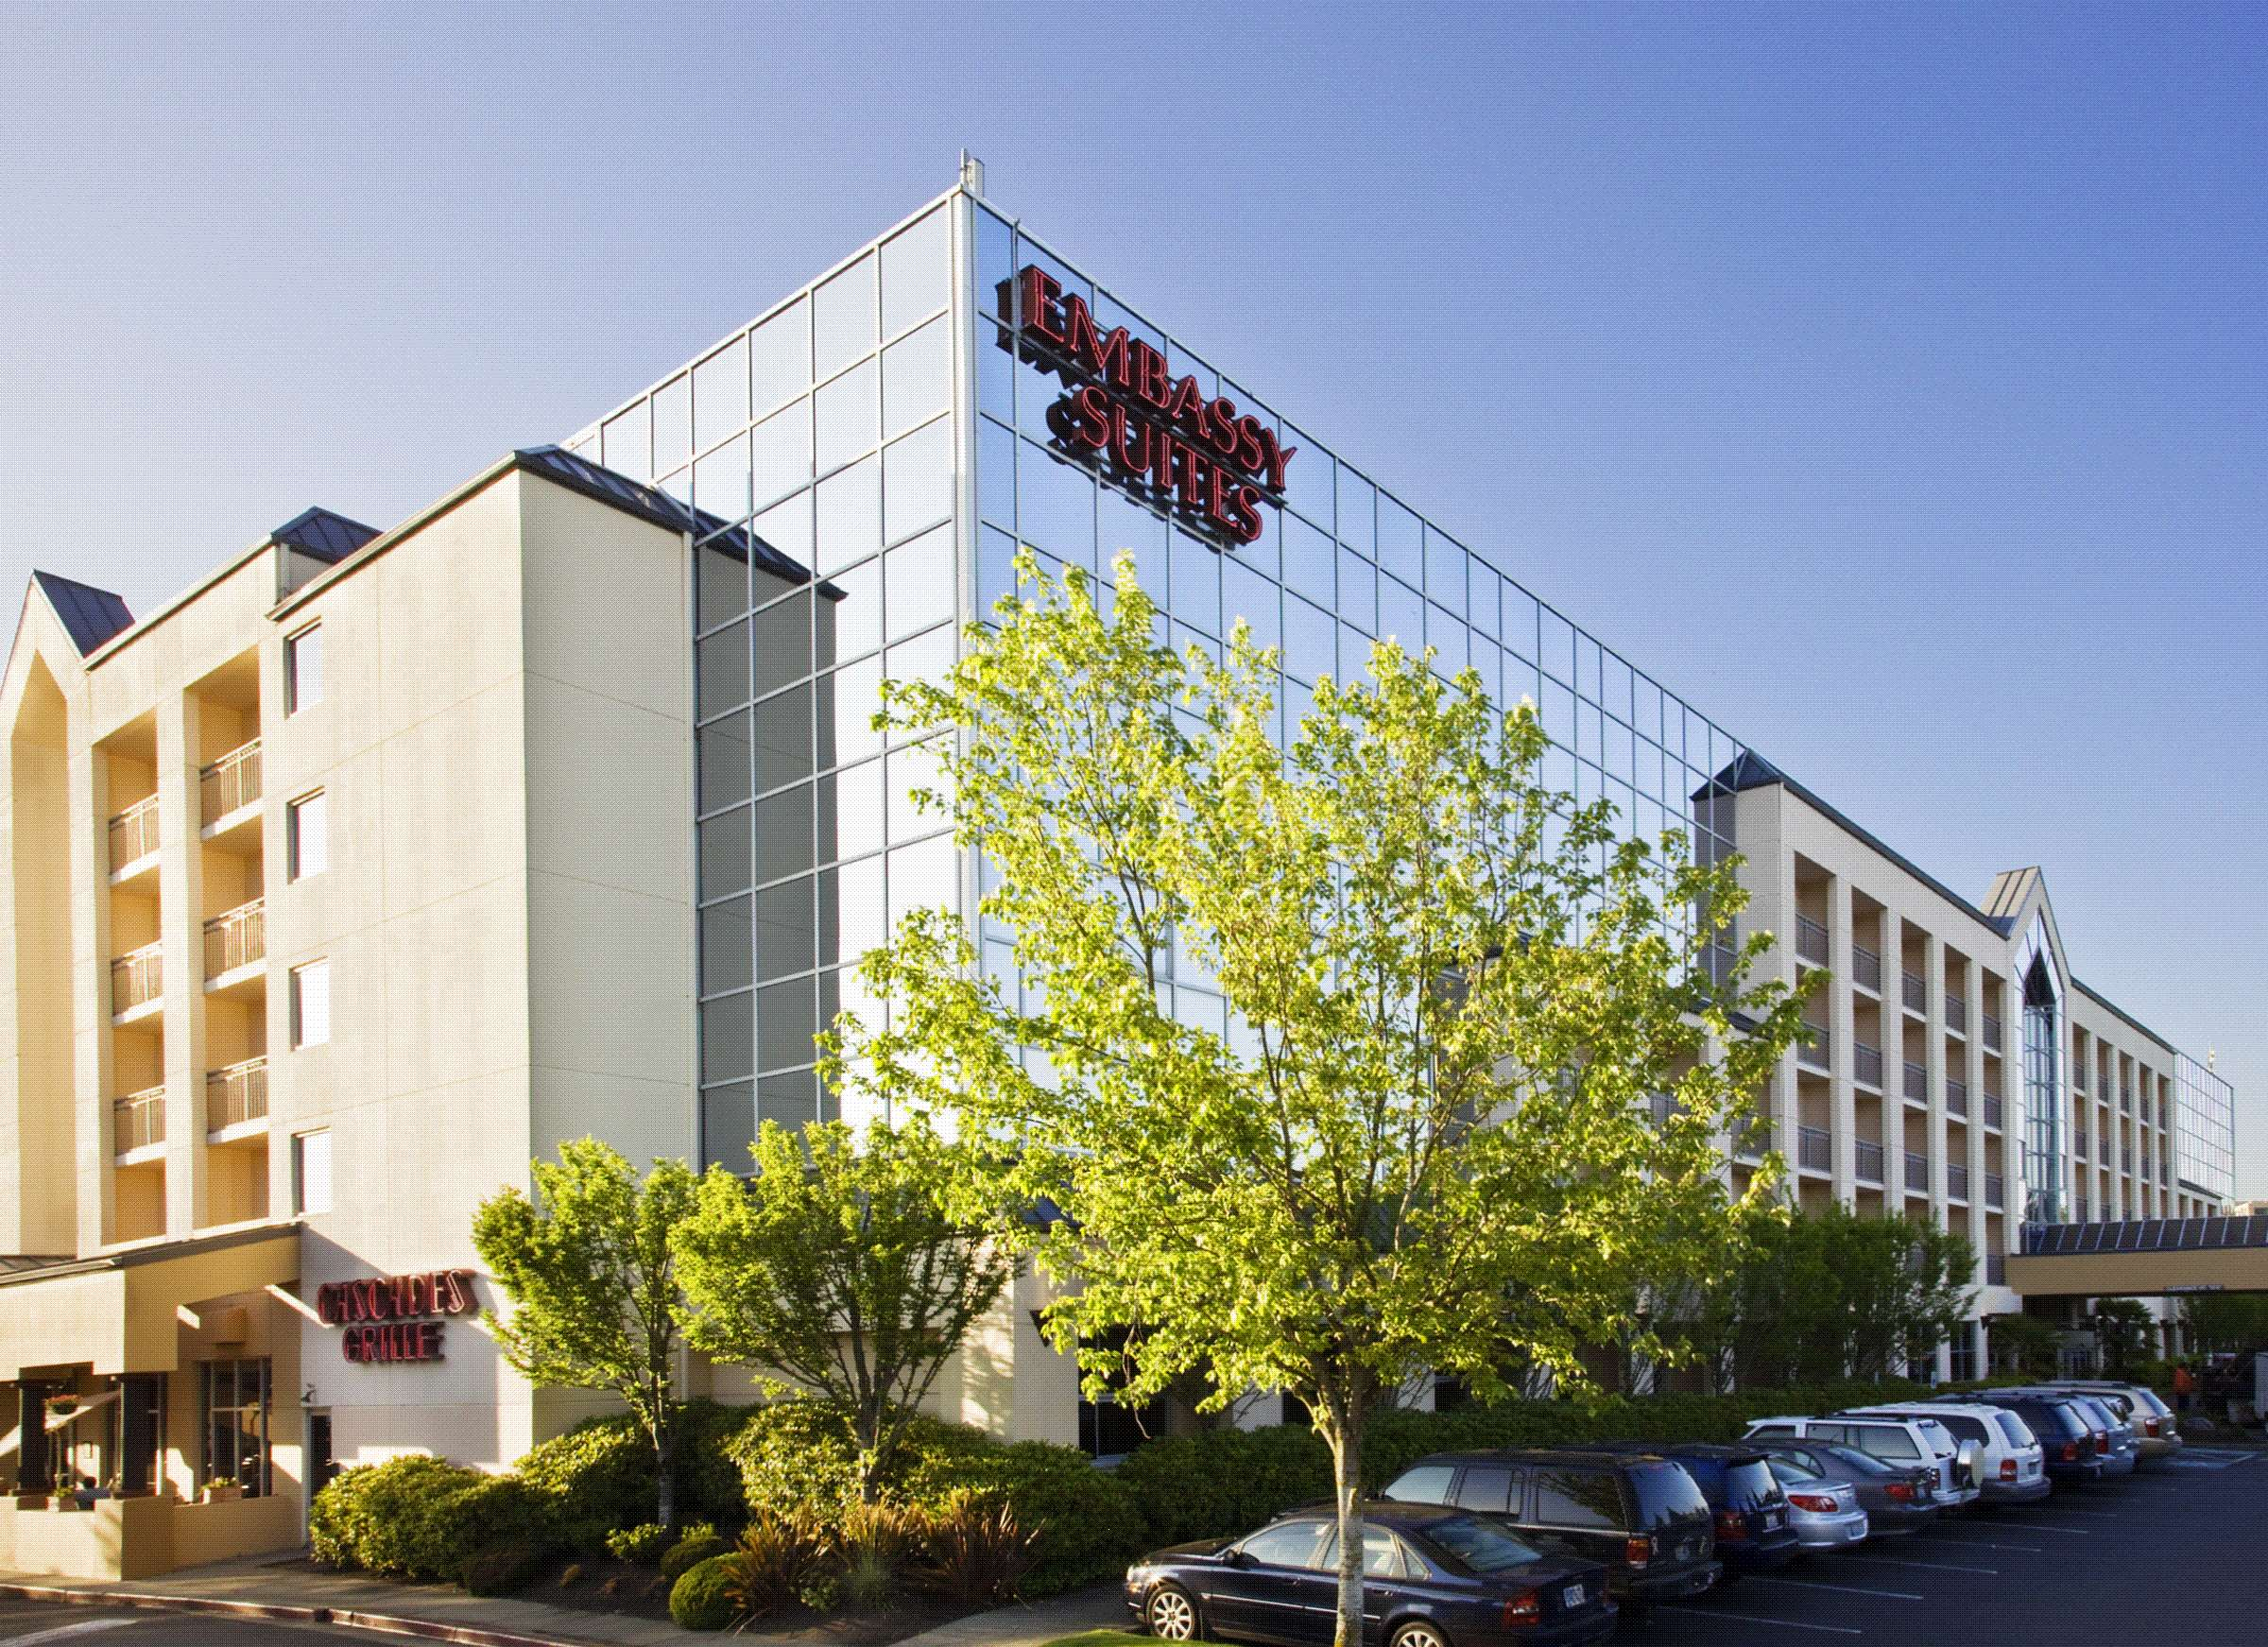 Hotels And Motels In Bellevue Wa